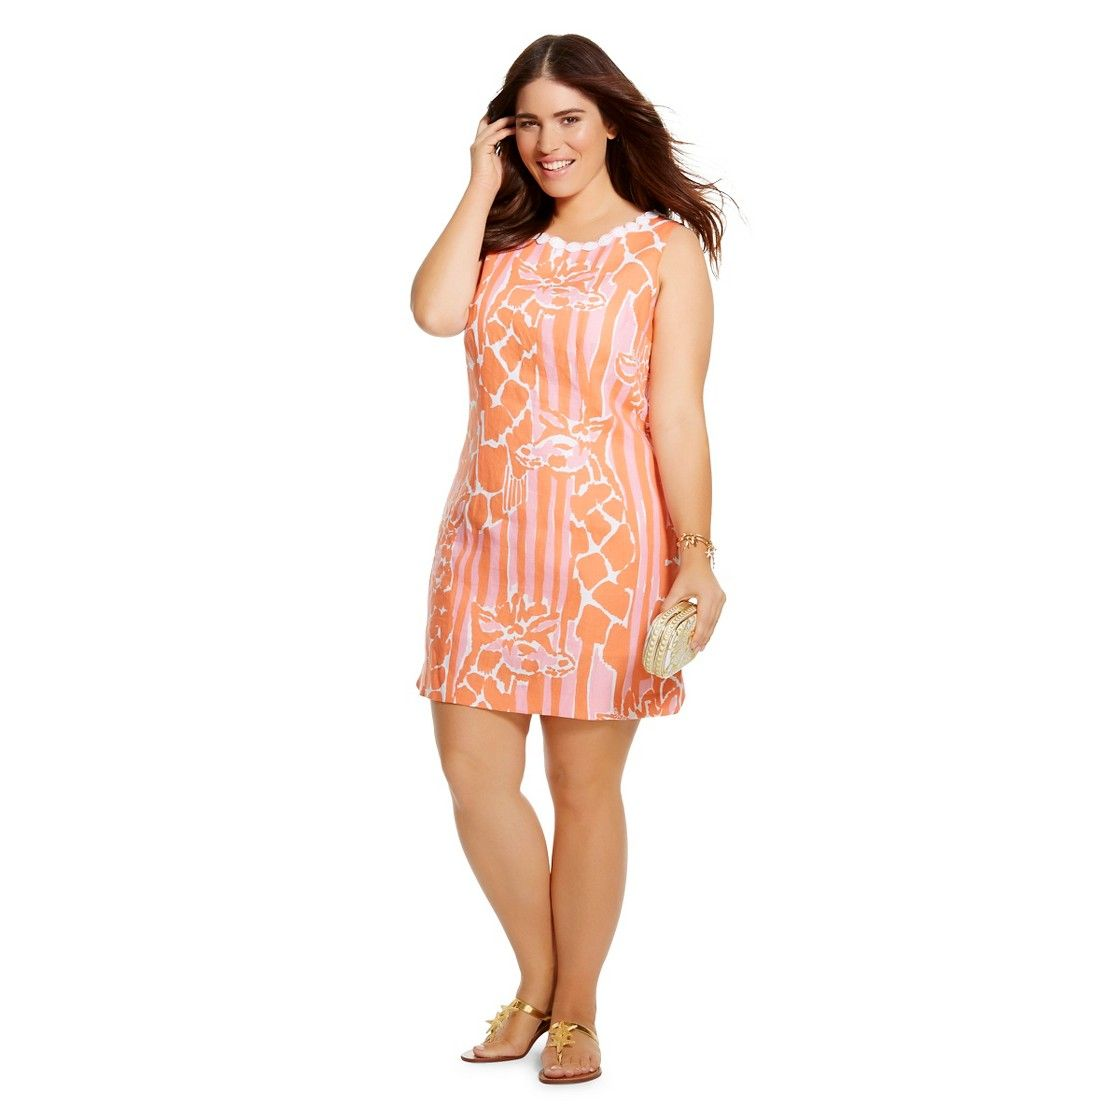 8f3de7c12bb Lilly Pulitzer for Target Women s Plus Size Linen Shift Dress - Giraffeeey